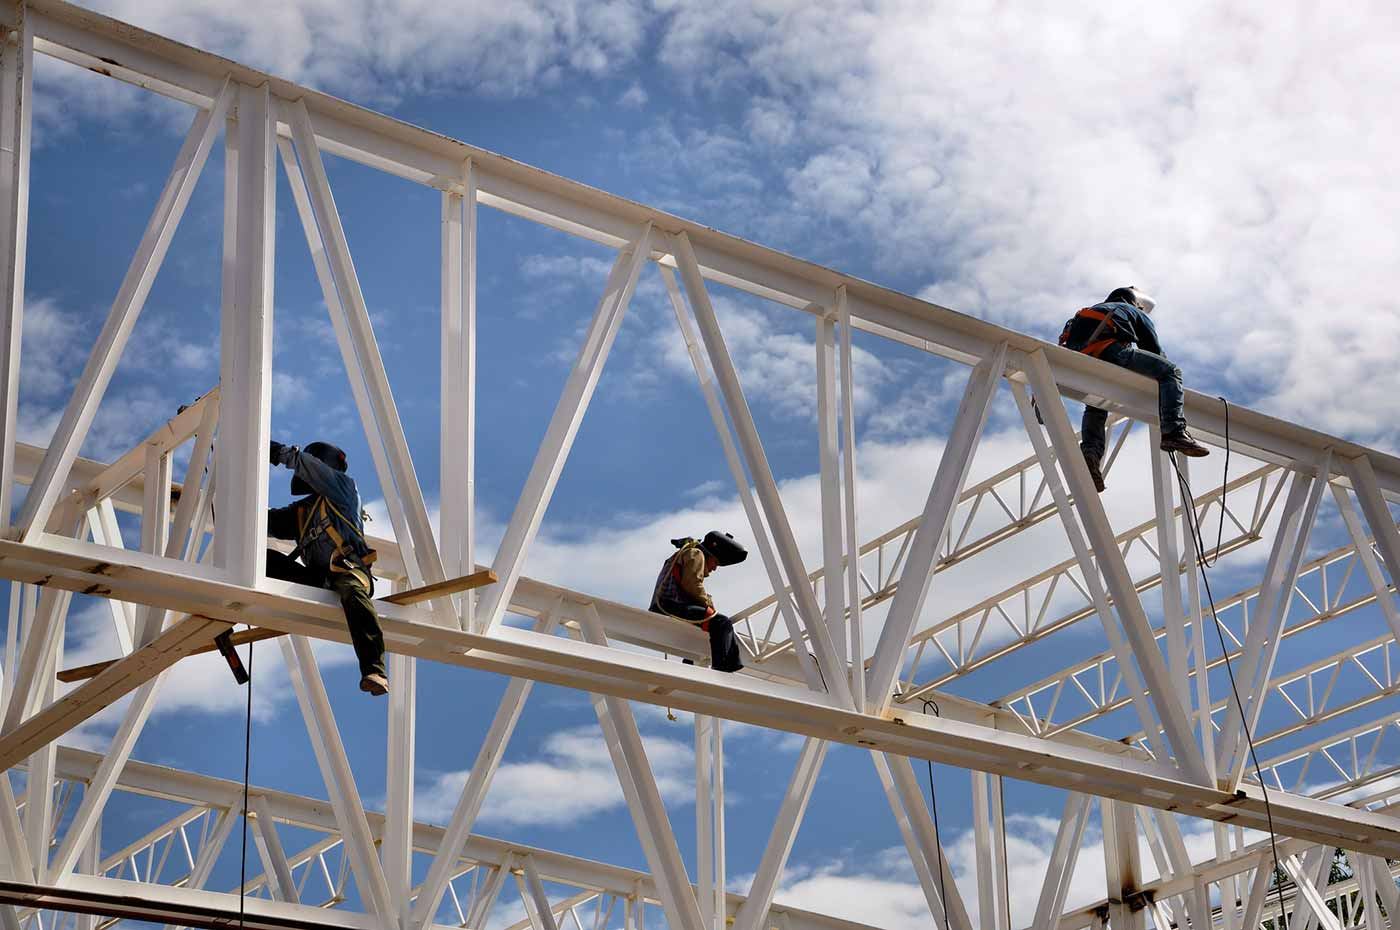 Workers on beams